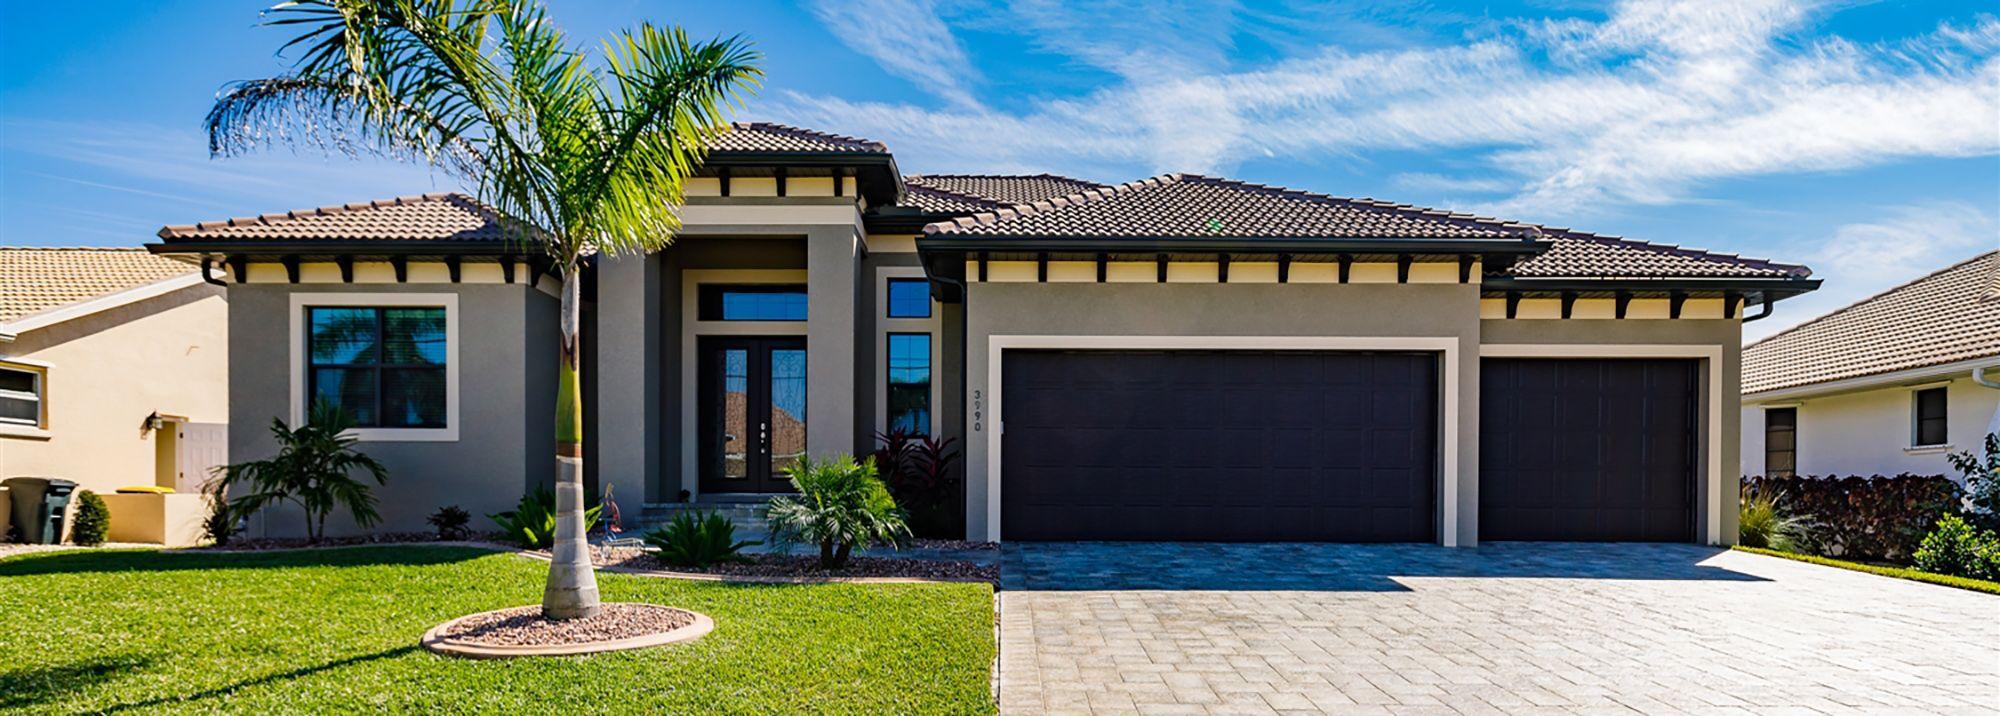 3990 la costa island court punta gorda fl home for sale